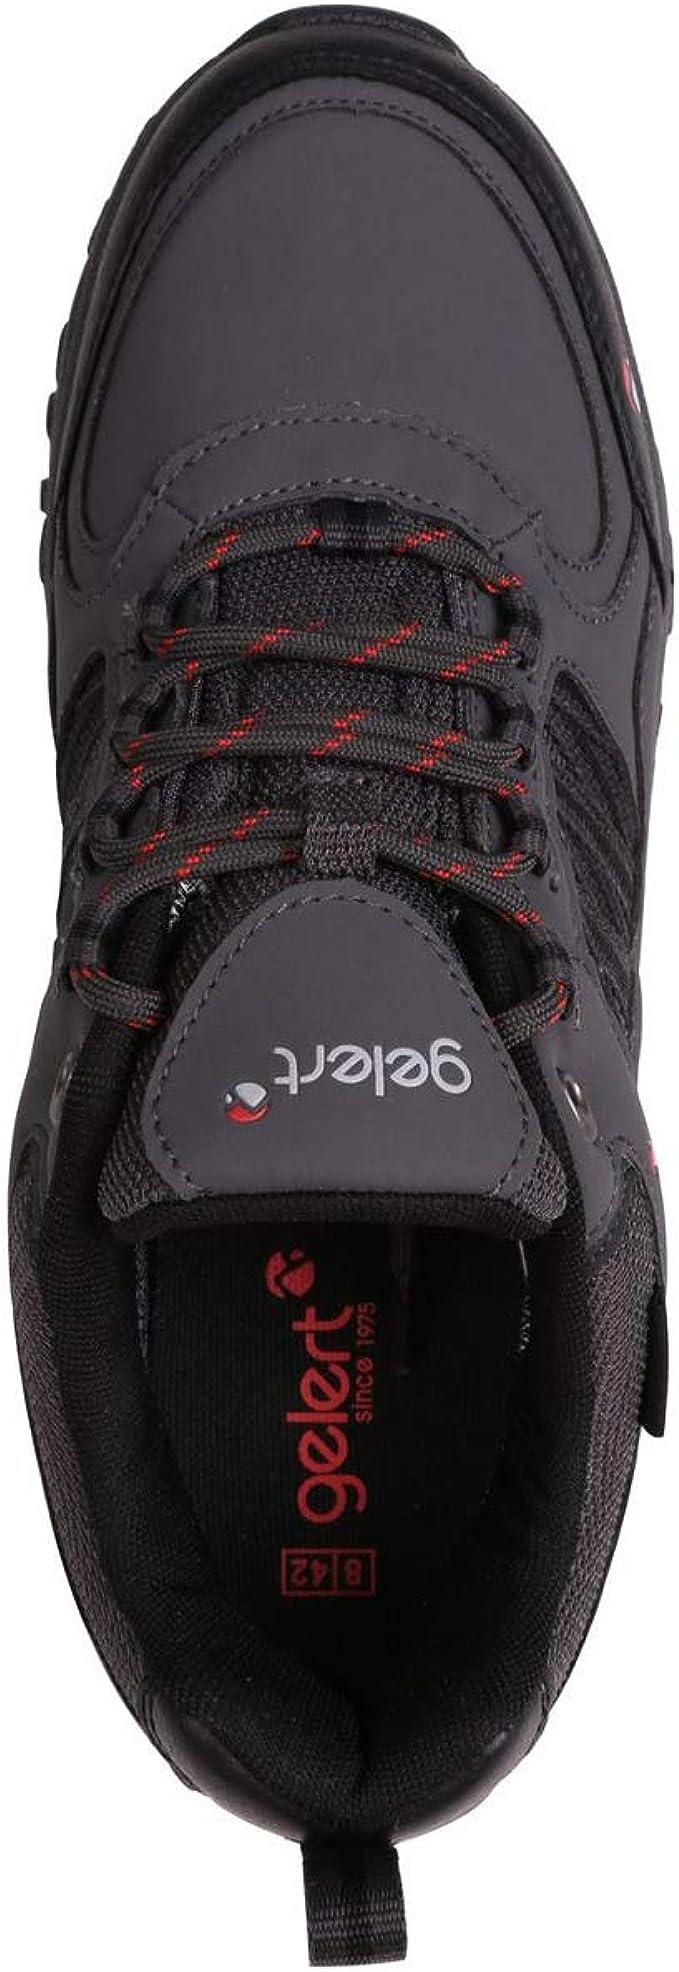 Horizon Waterproof Low Hiking Shoes